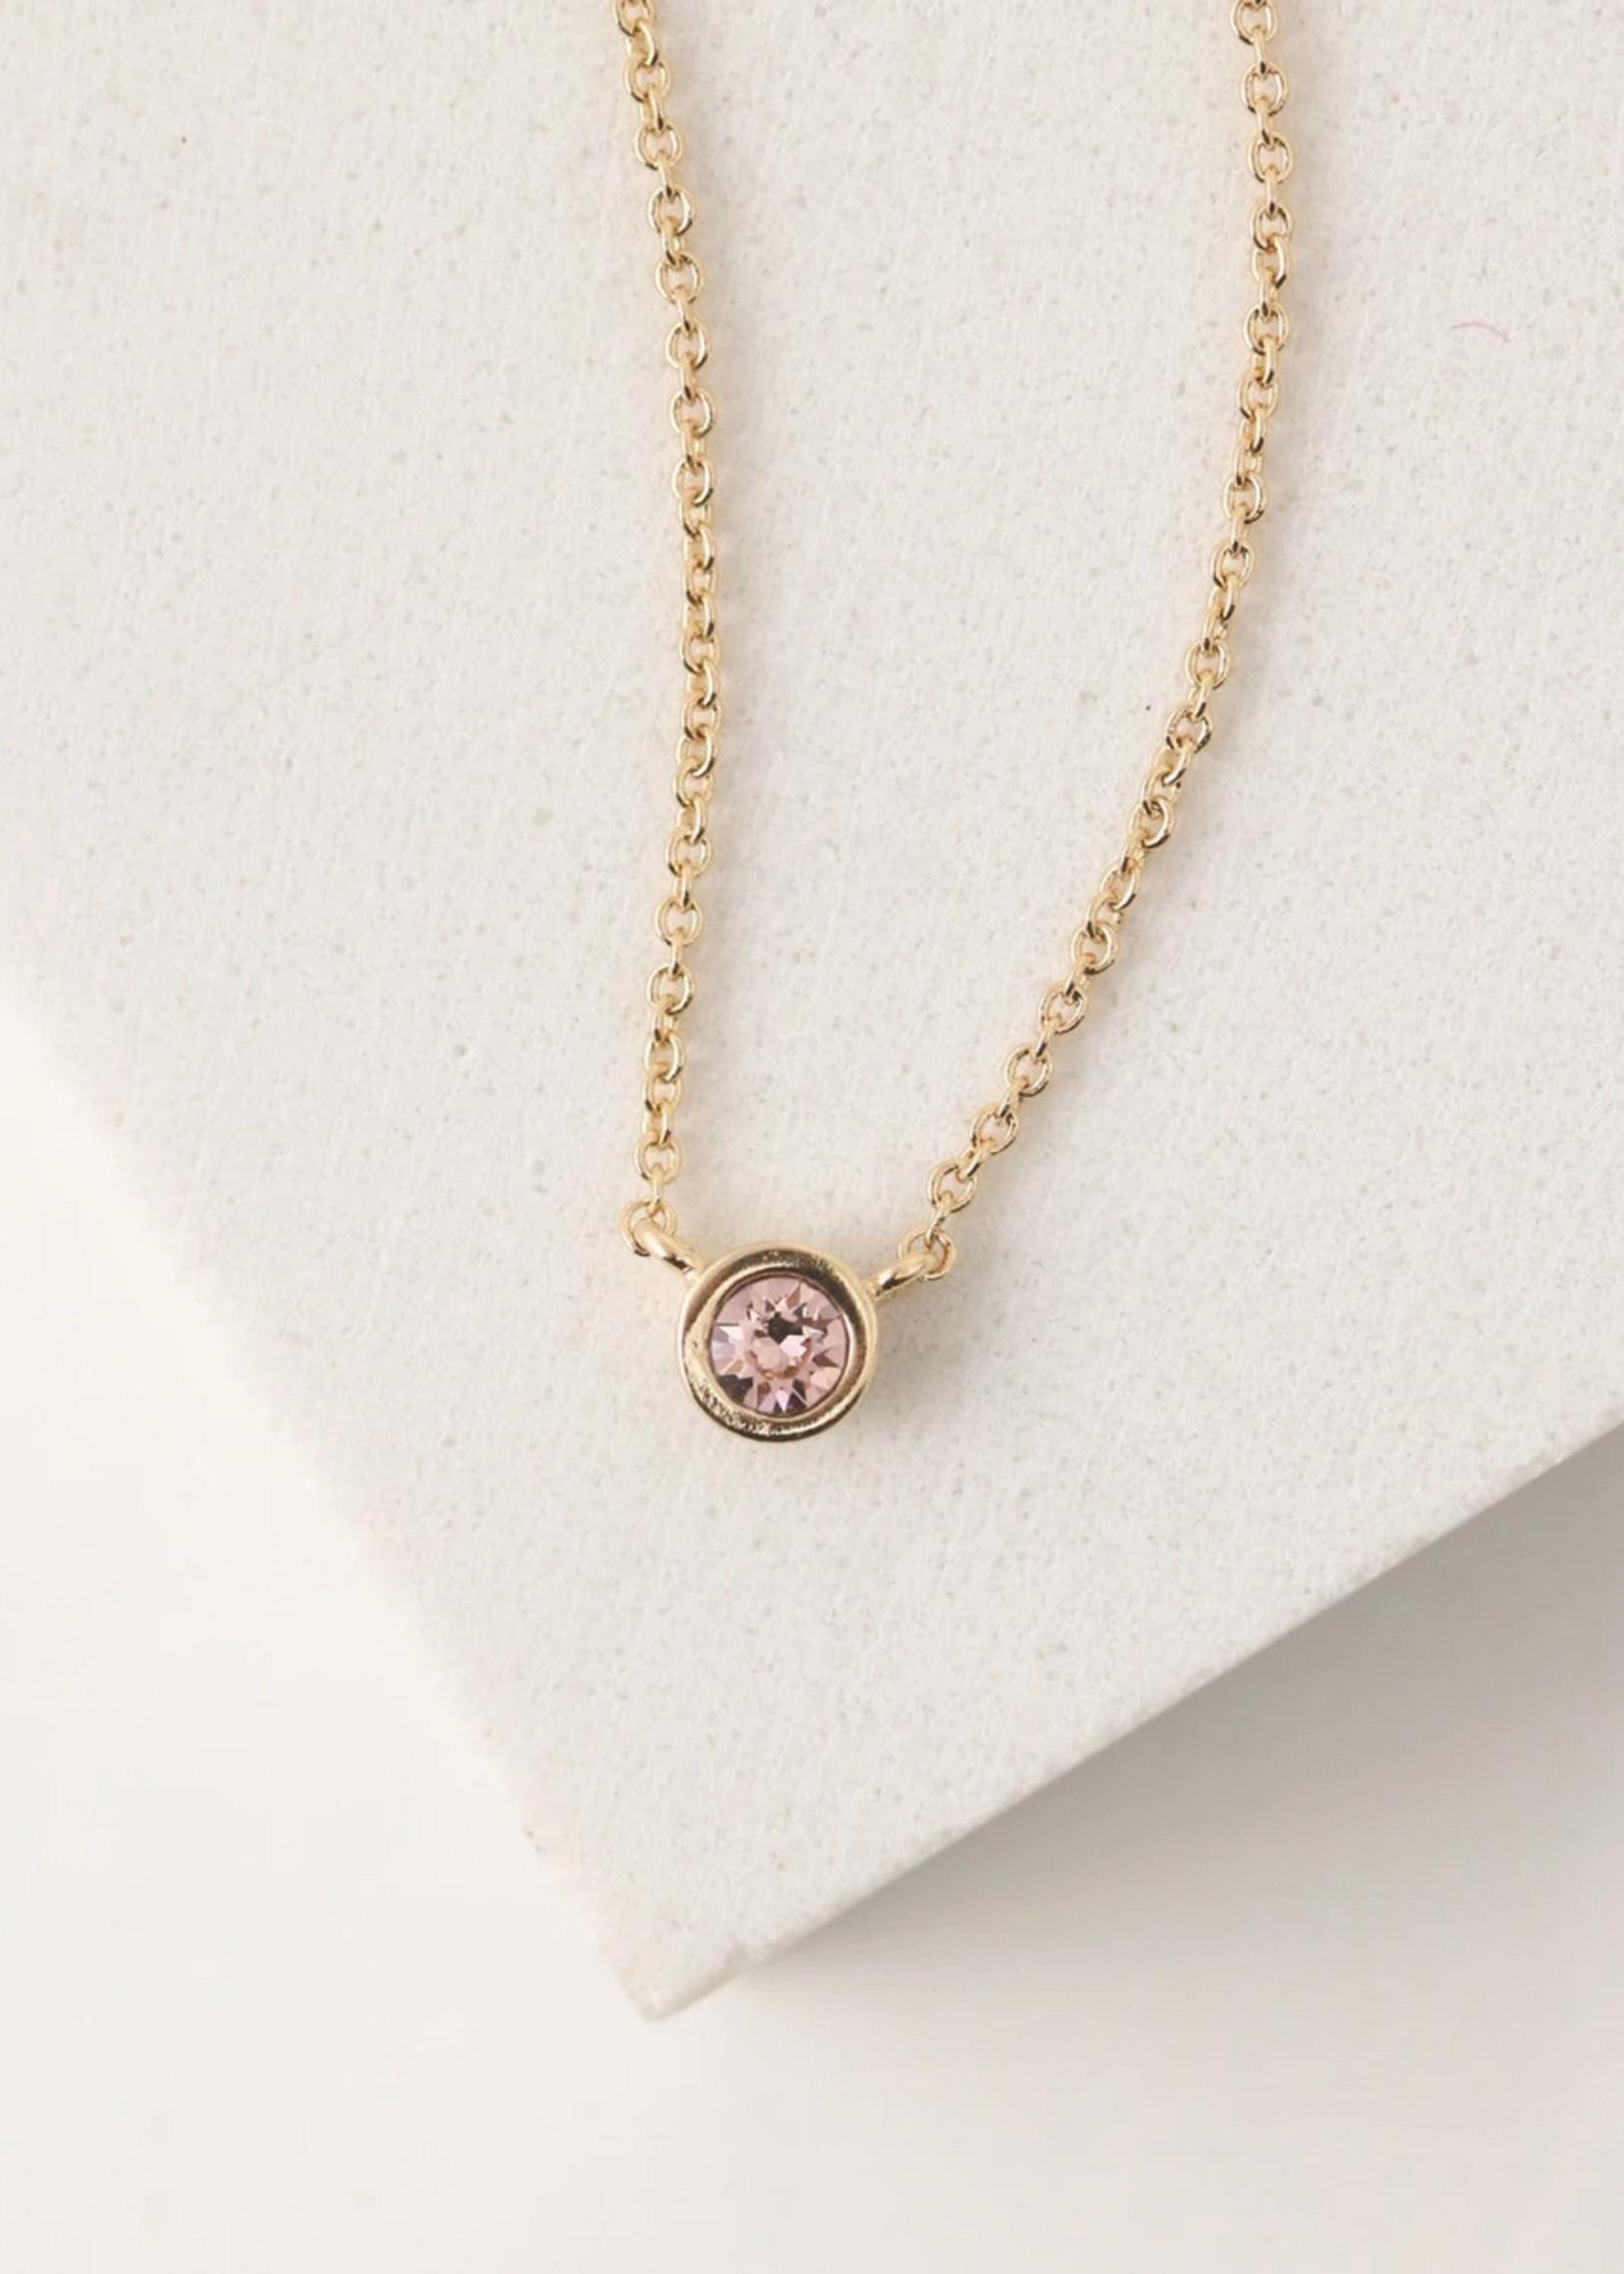 October Kaleidoscope Birthstone Necklace-Gold